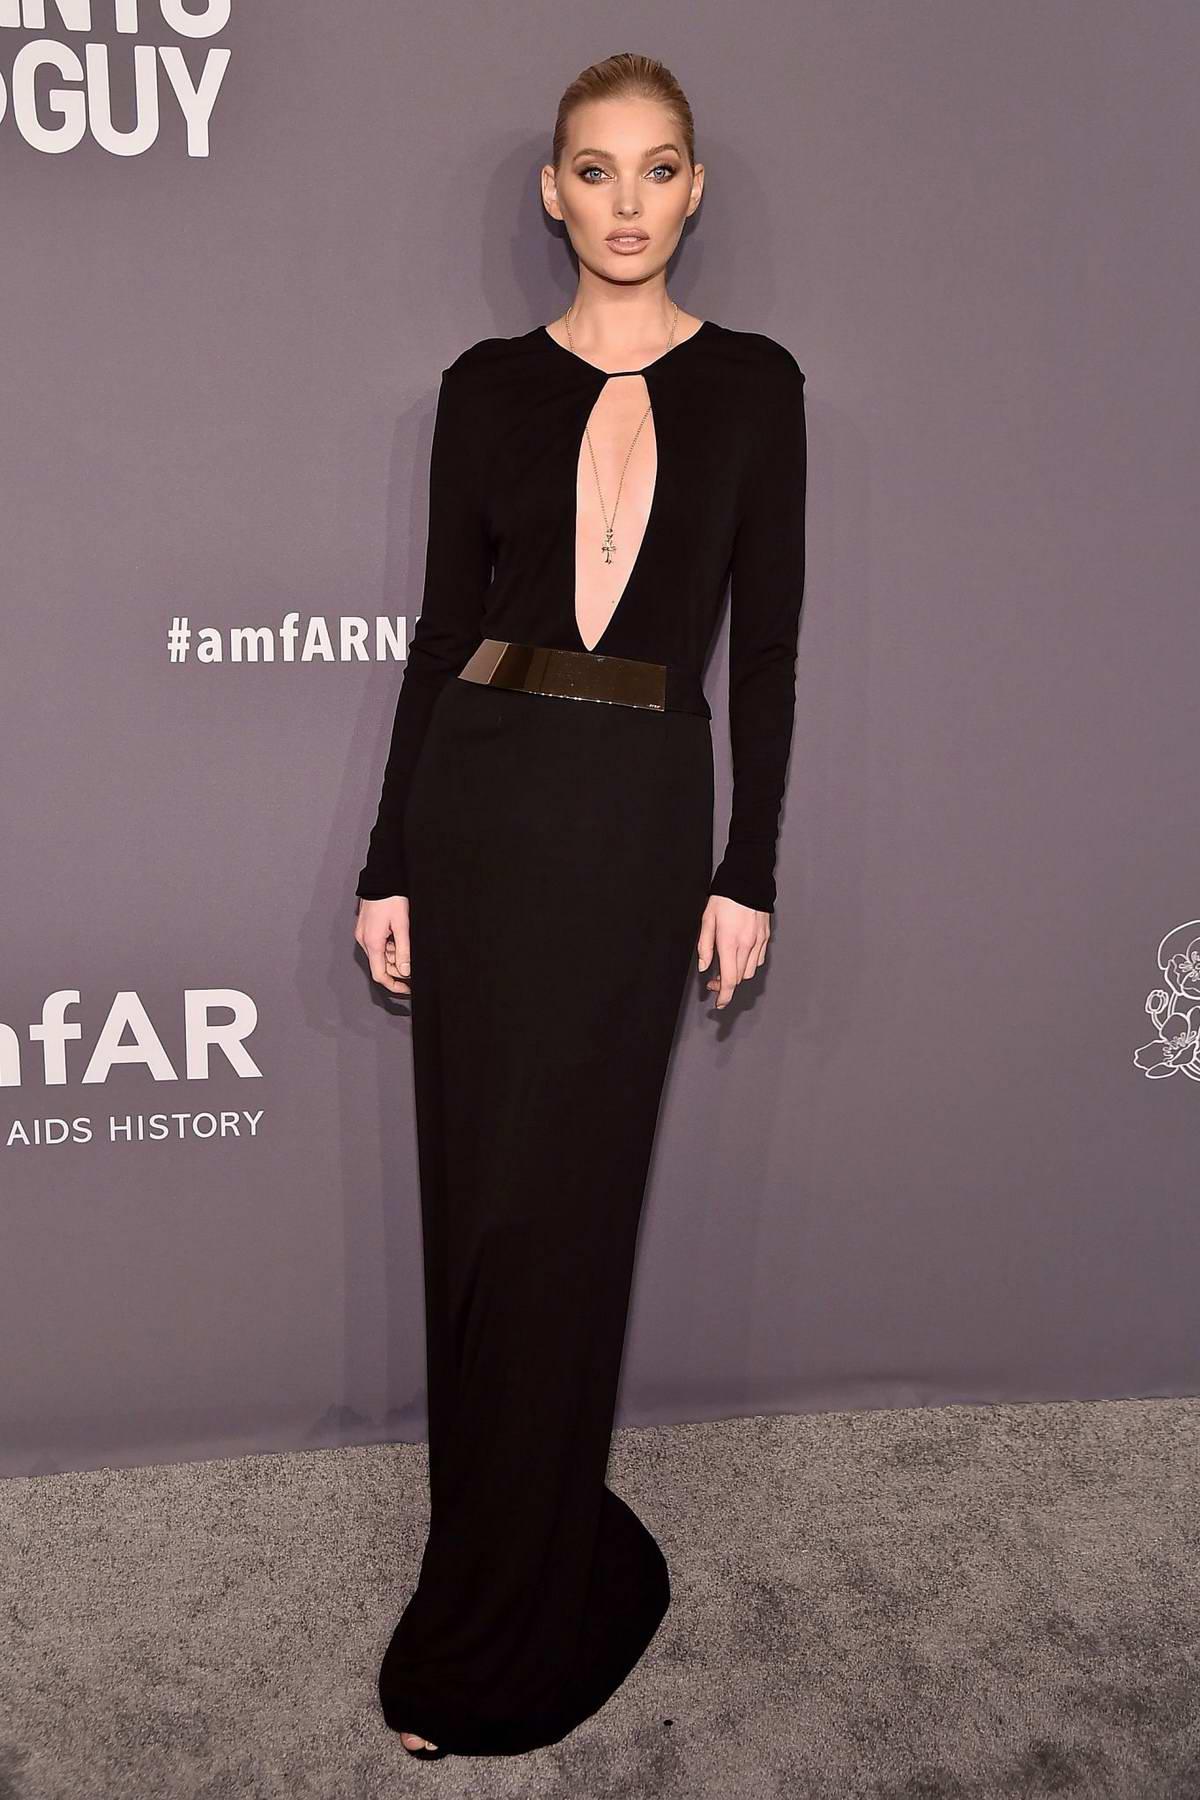 Elsa Hosk attends amfAR New York Gala 2019 at Cipriani Wall Street in New York City